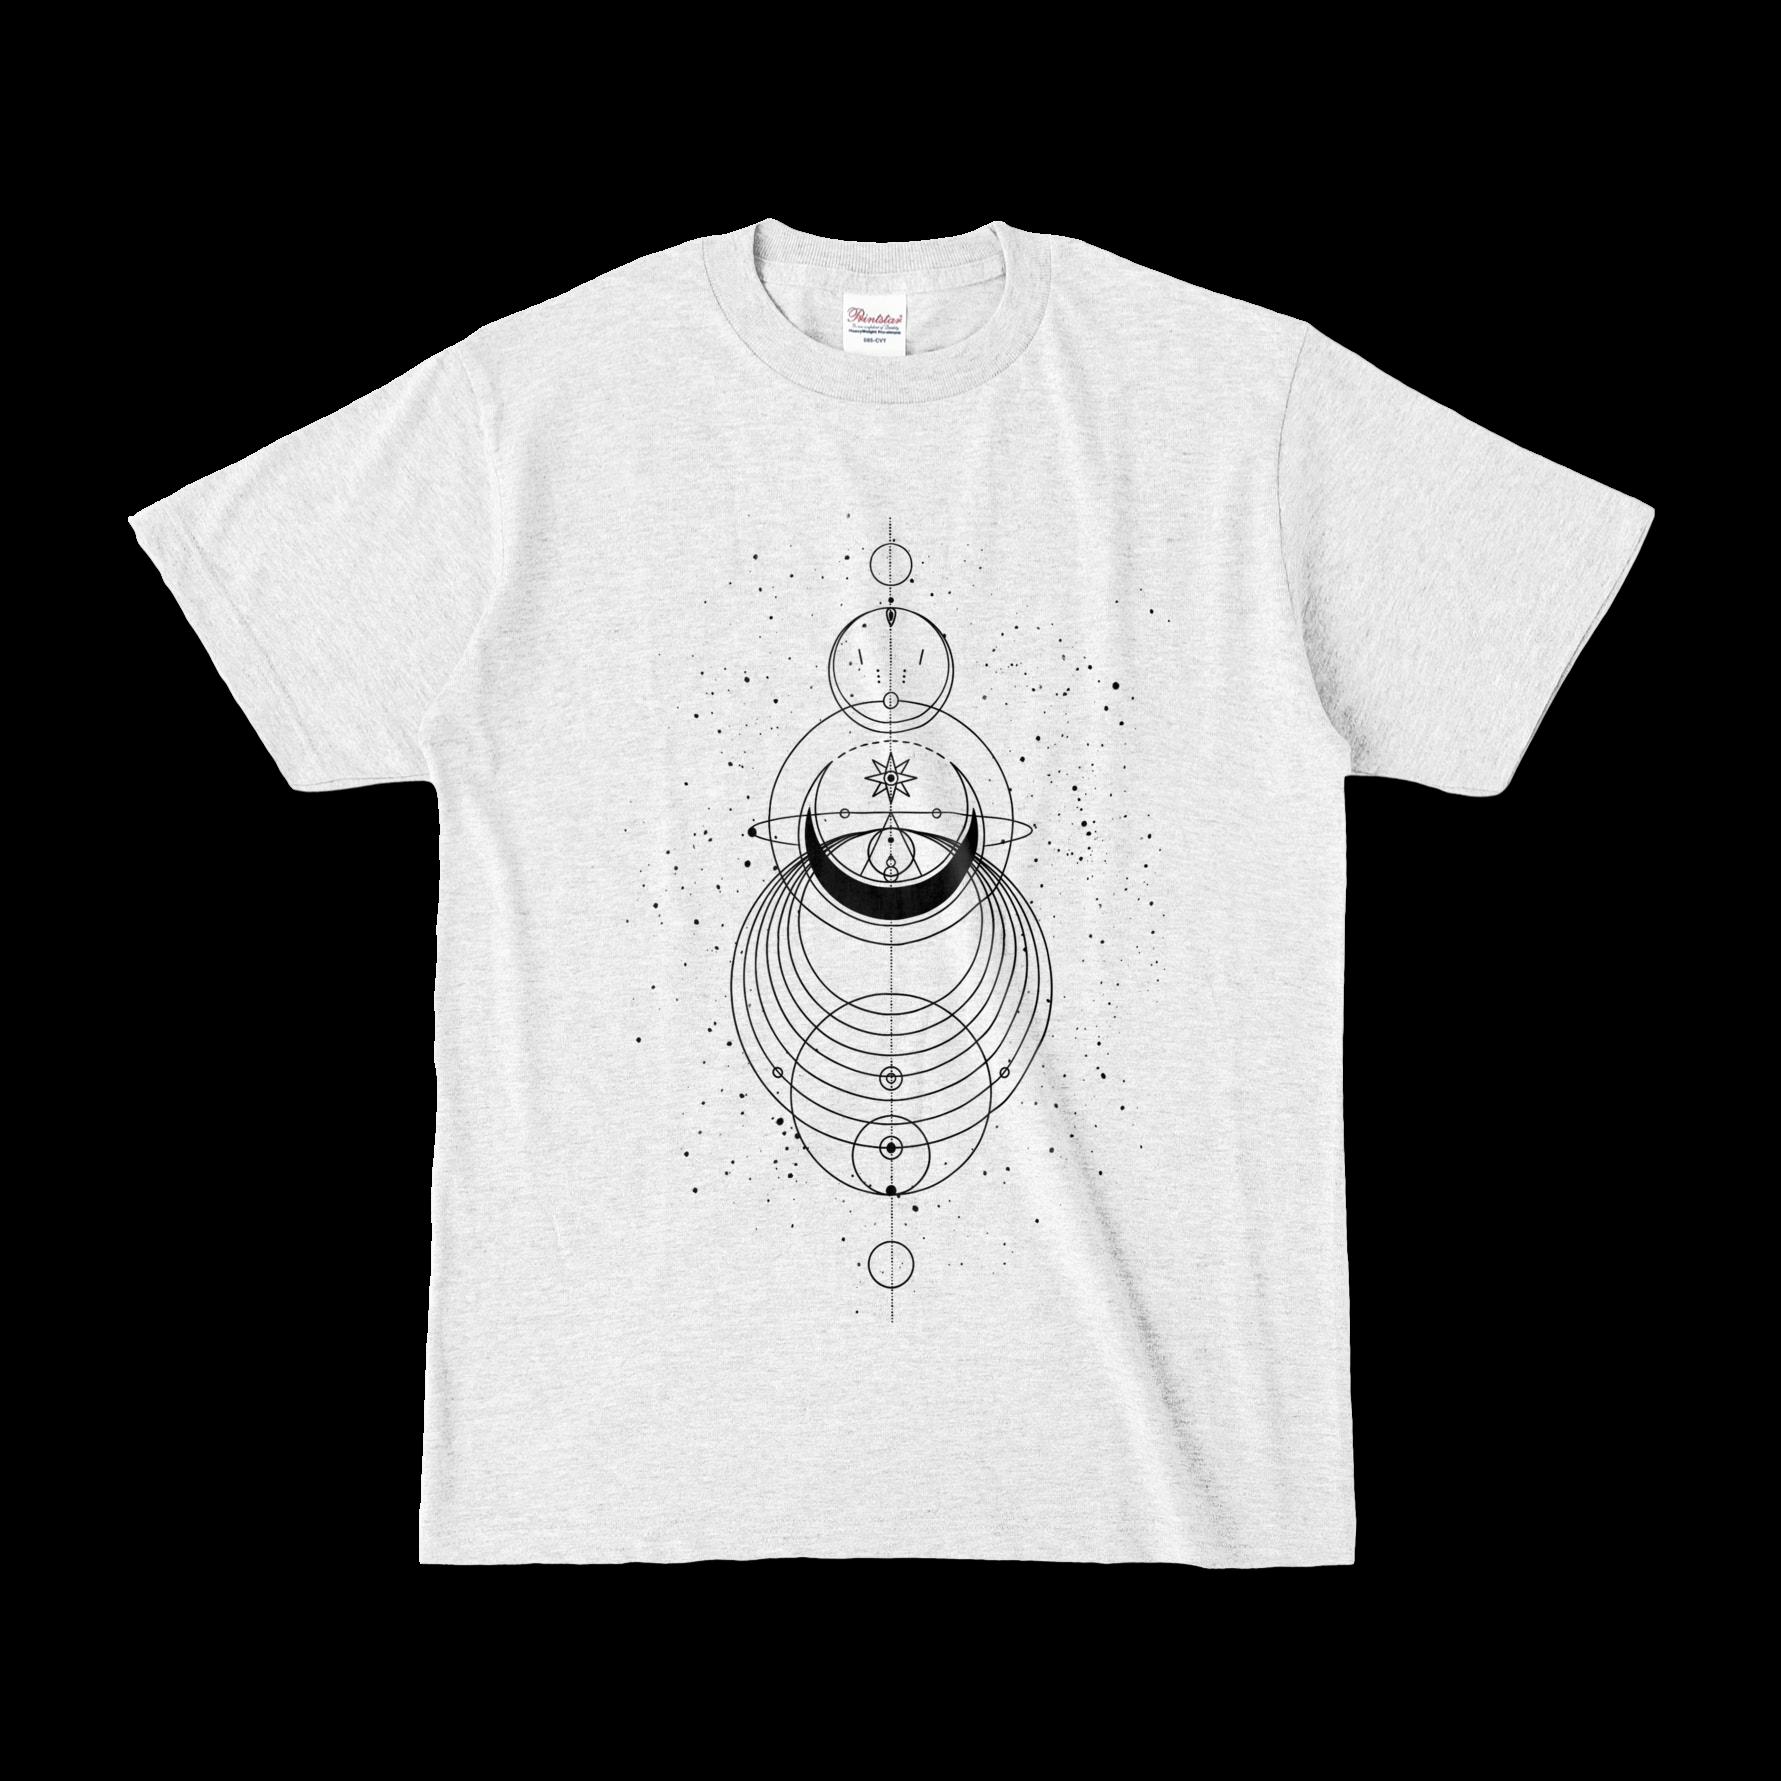 Geometric オリジナルデザインTシャツ アッシュ